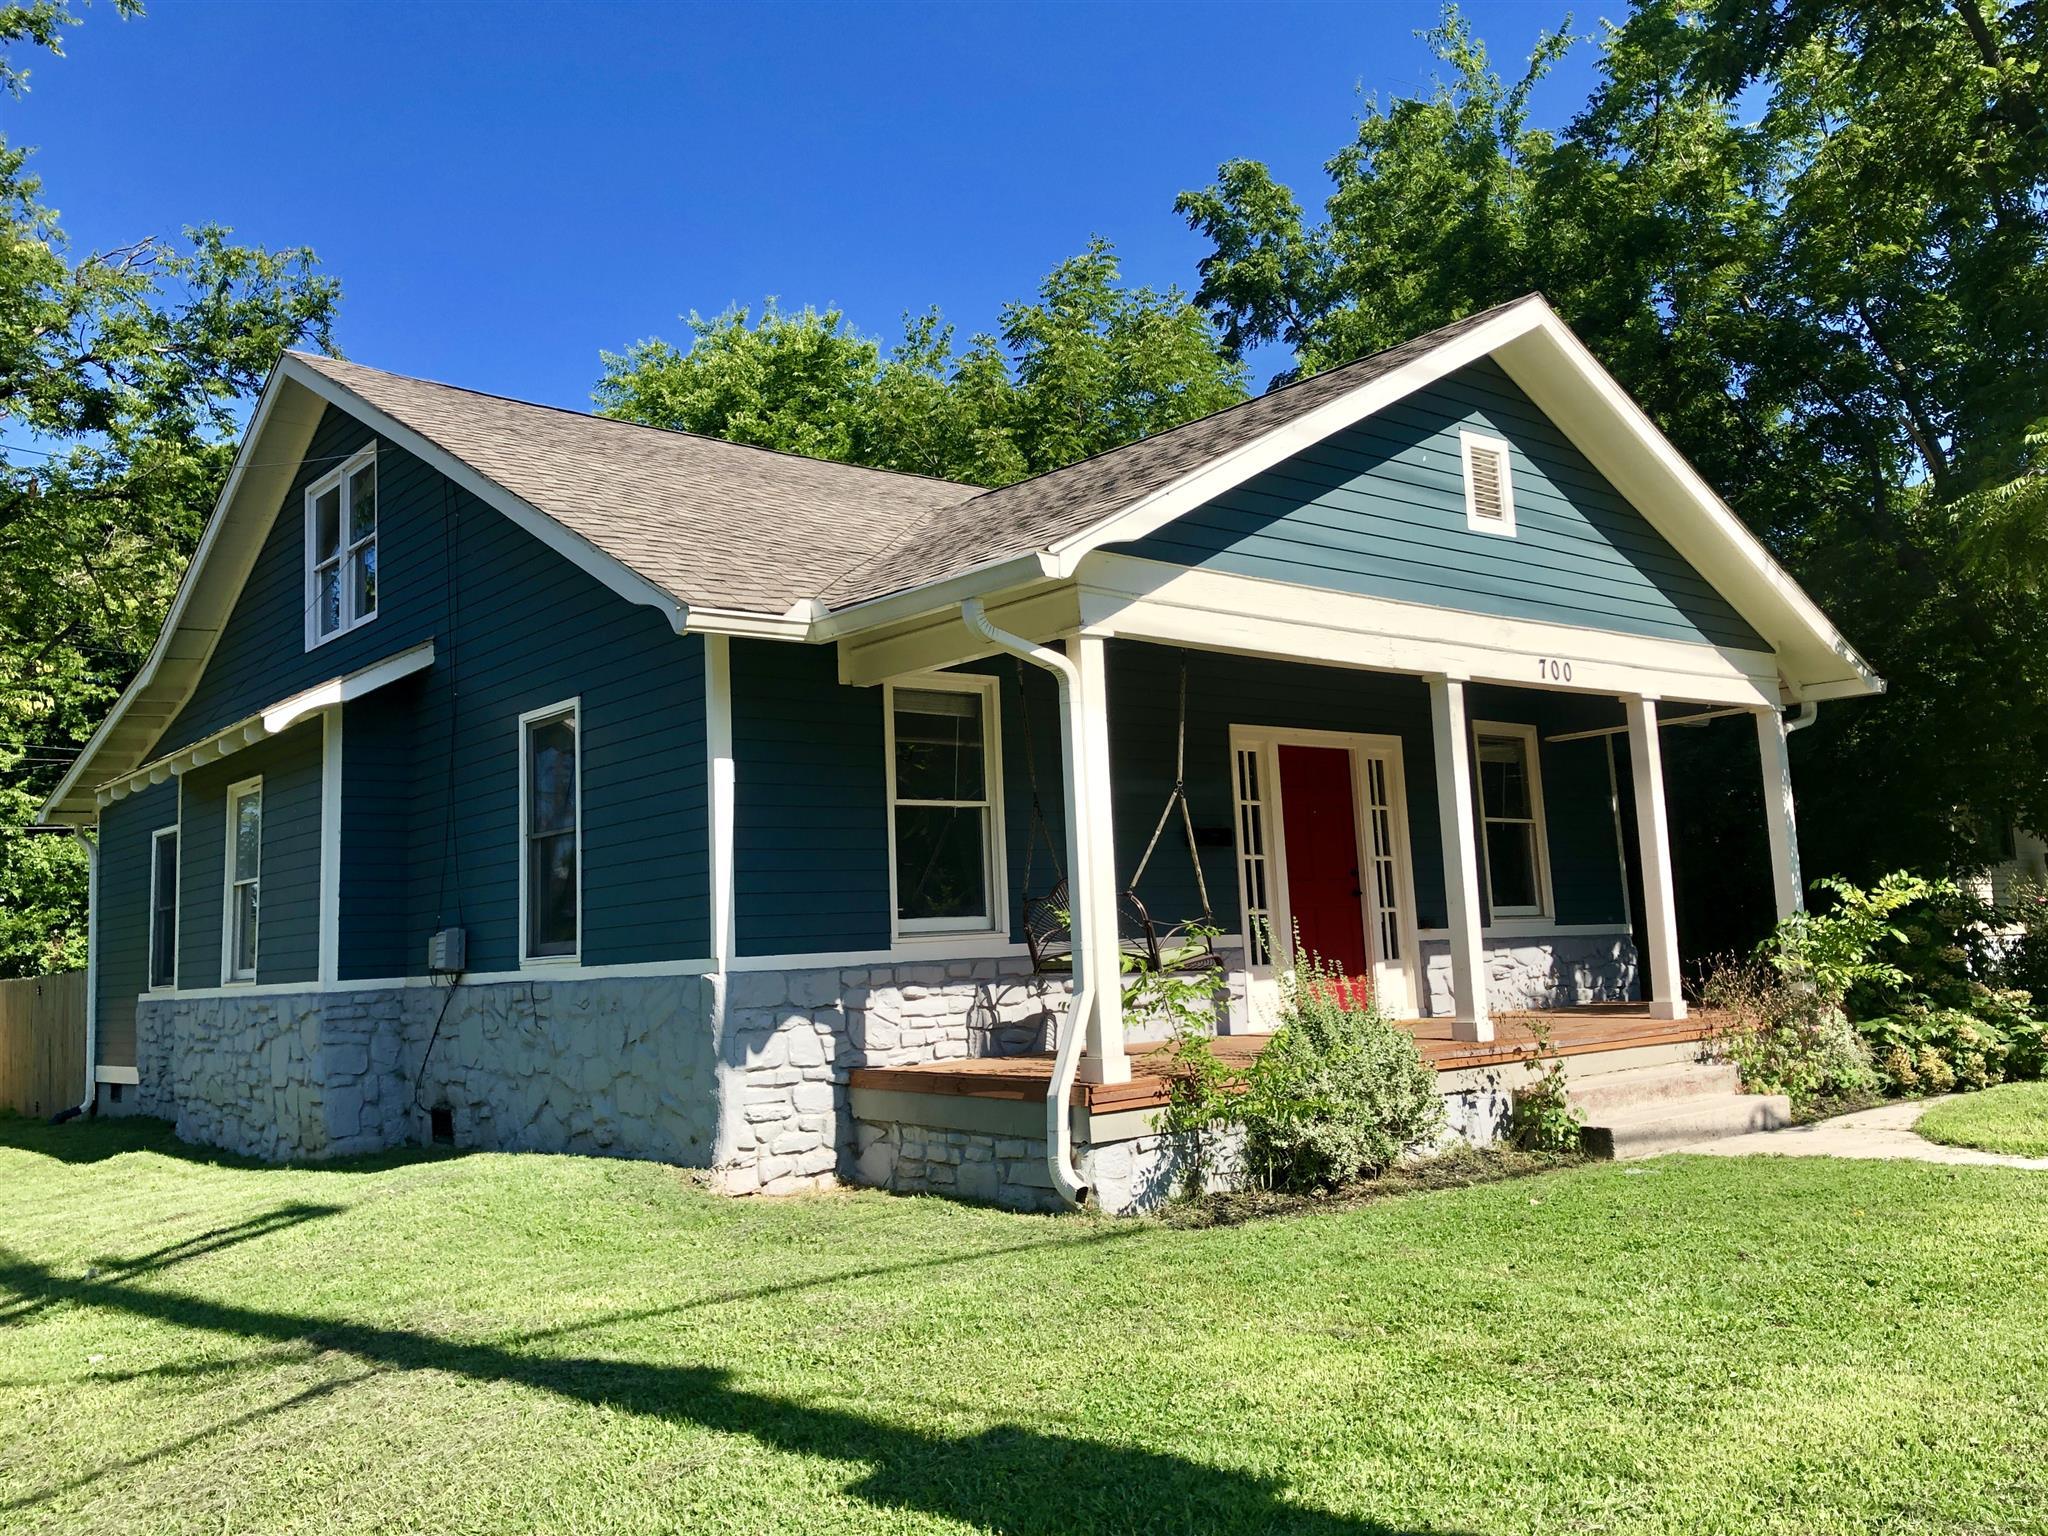 700 McFerrin Ave, Nashville, TN 37206 - Nashville, TN real estate listing